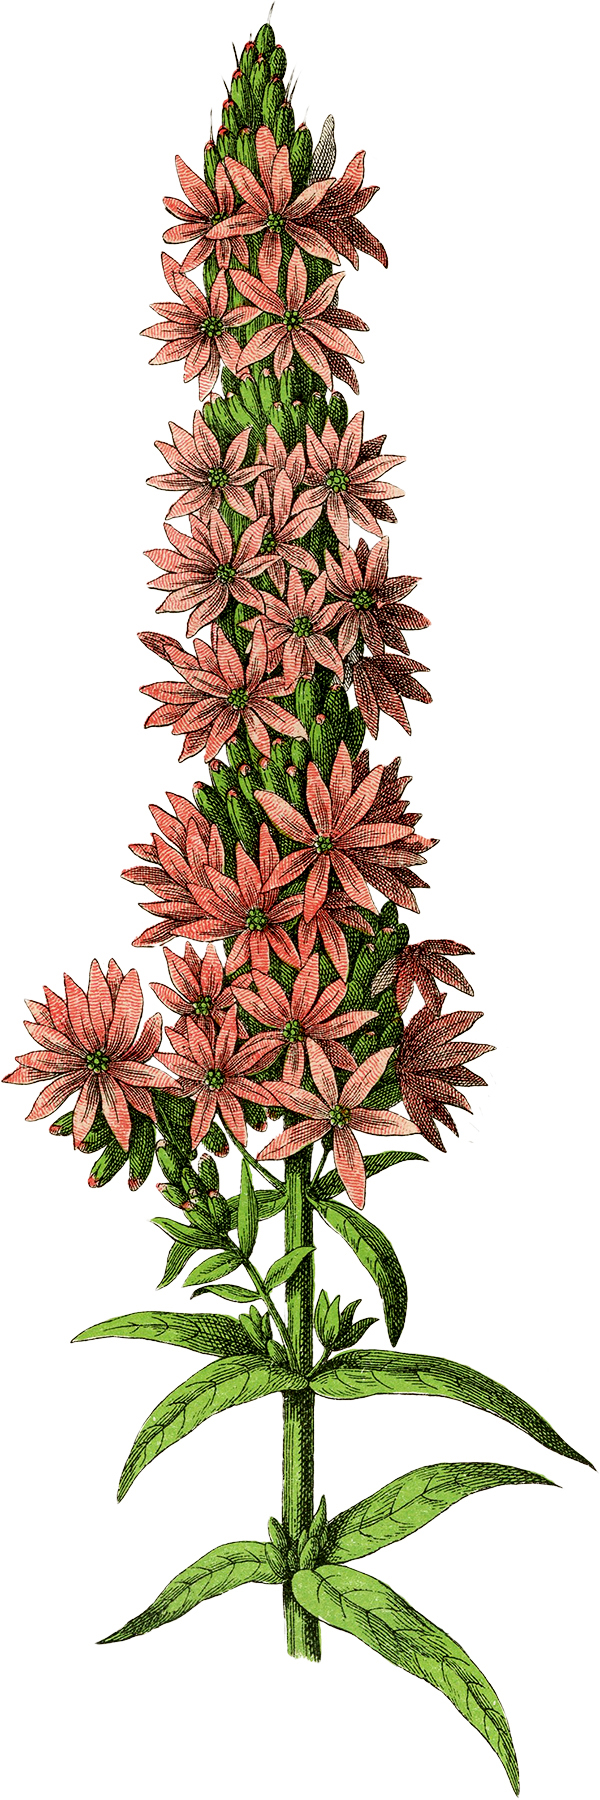 Free Botanical Flower Clip Art - The Graphics Fairy